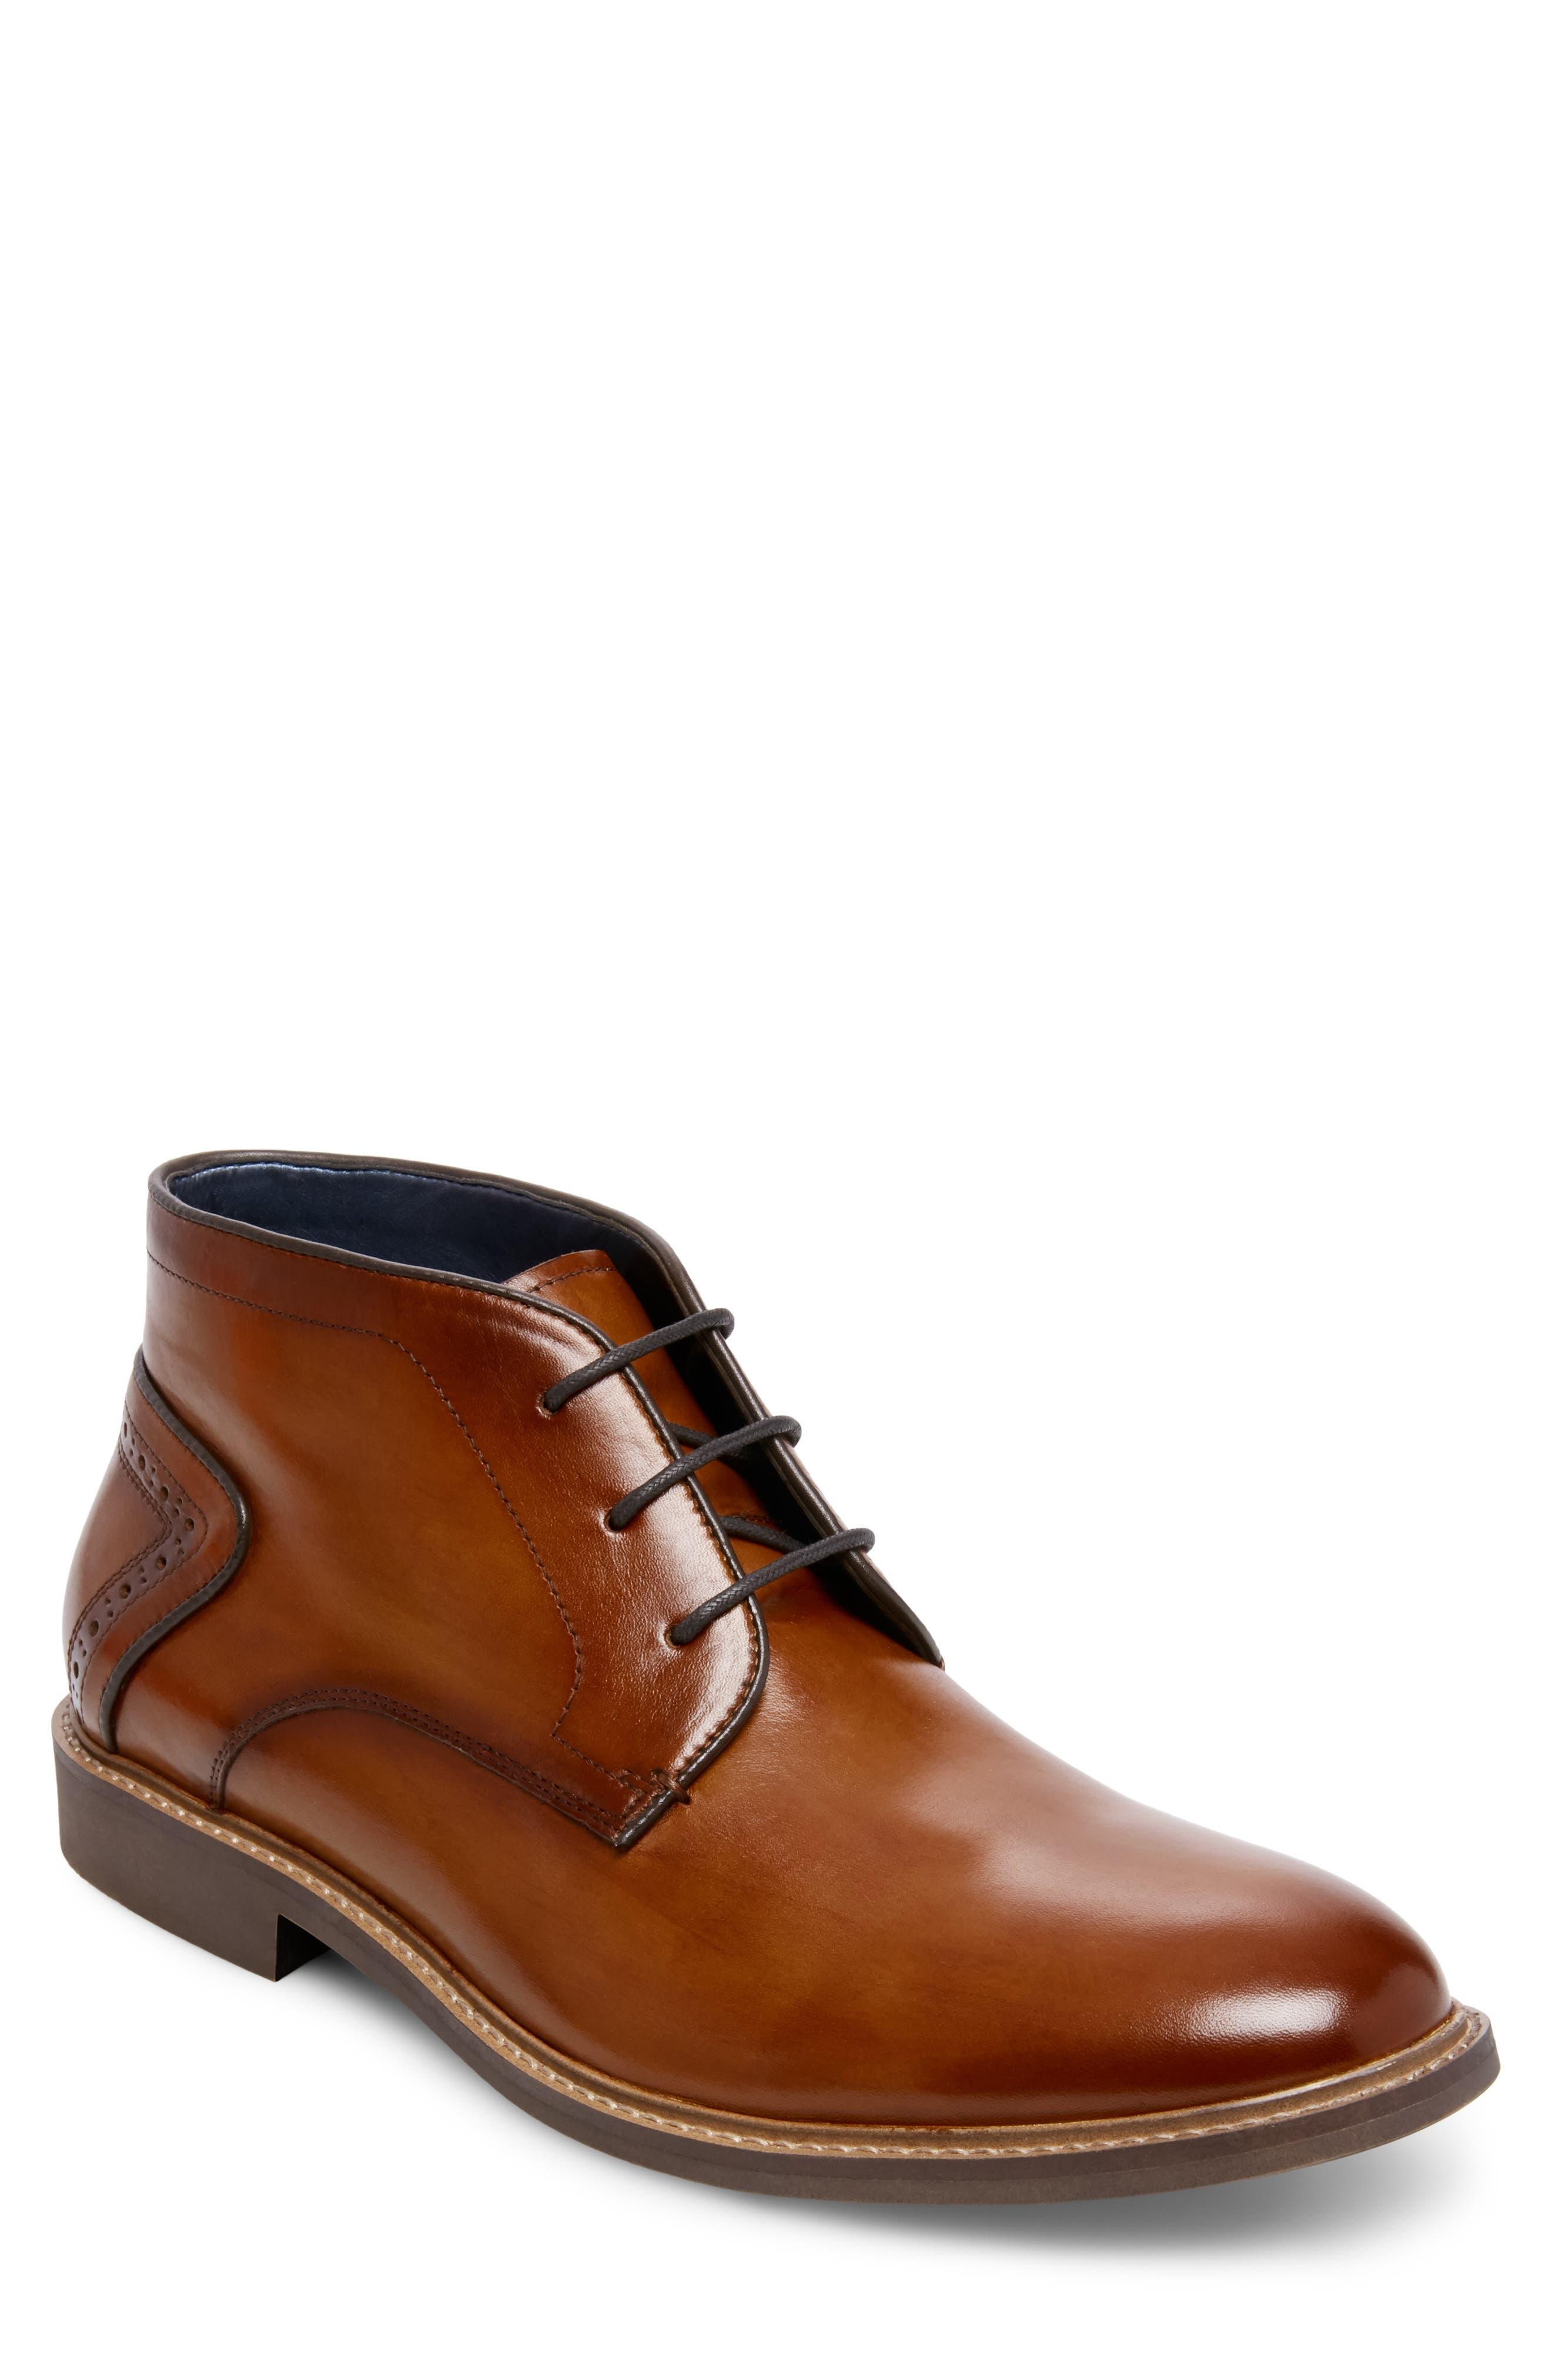 Backster Plain Toe Chukka Boot,                             Main thumbnail 1, color,                             COGNAC LEATHER